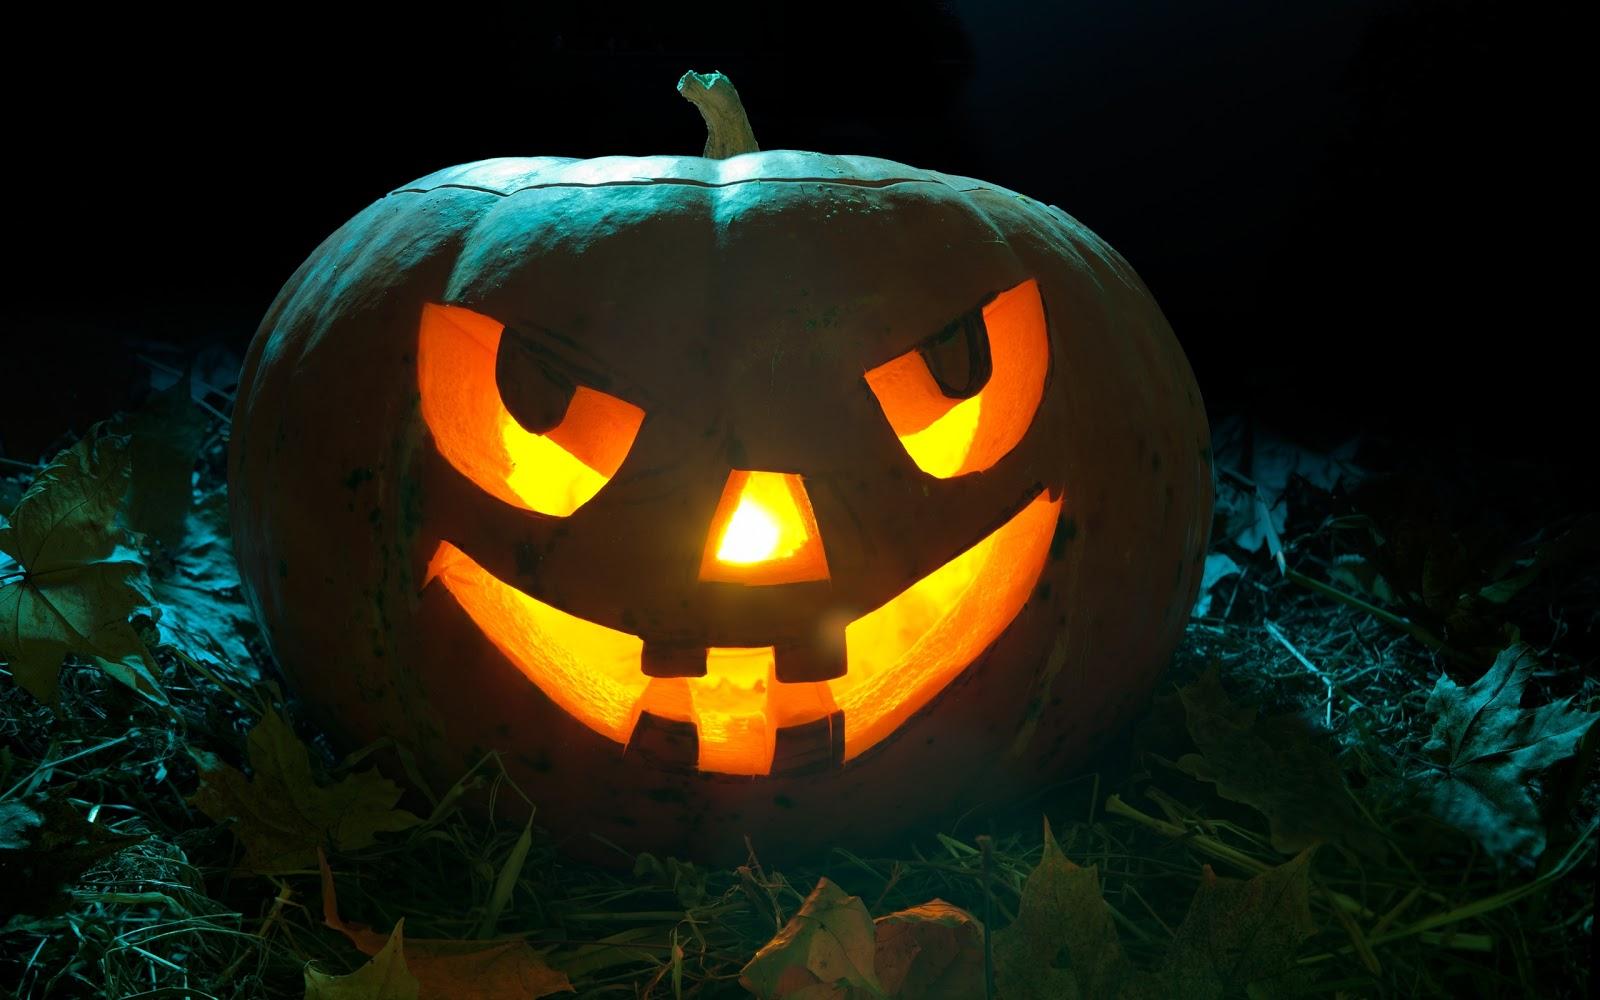 http://4.bp.blogspot.com/-YdFTFRqCmI4/UHbqL24hSrI/AAAAAAAAHRY/8BVxTBMb-nw/s1600/Halloween+Wallpaper+005.jpg